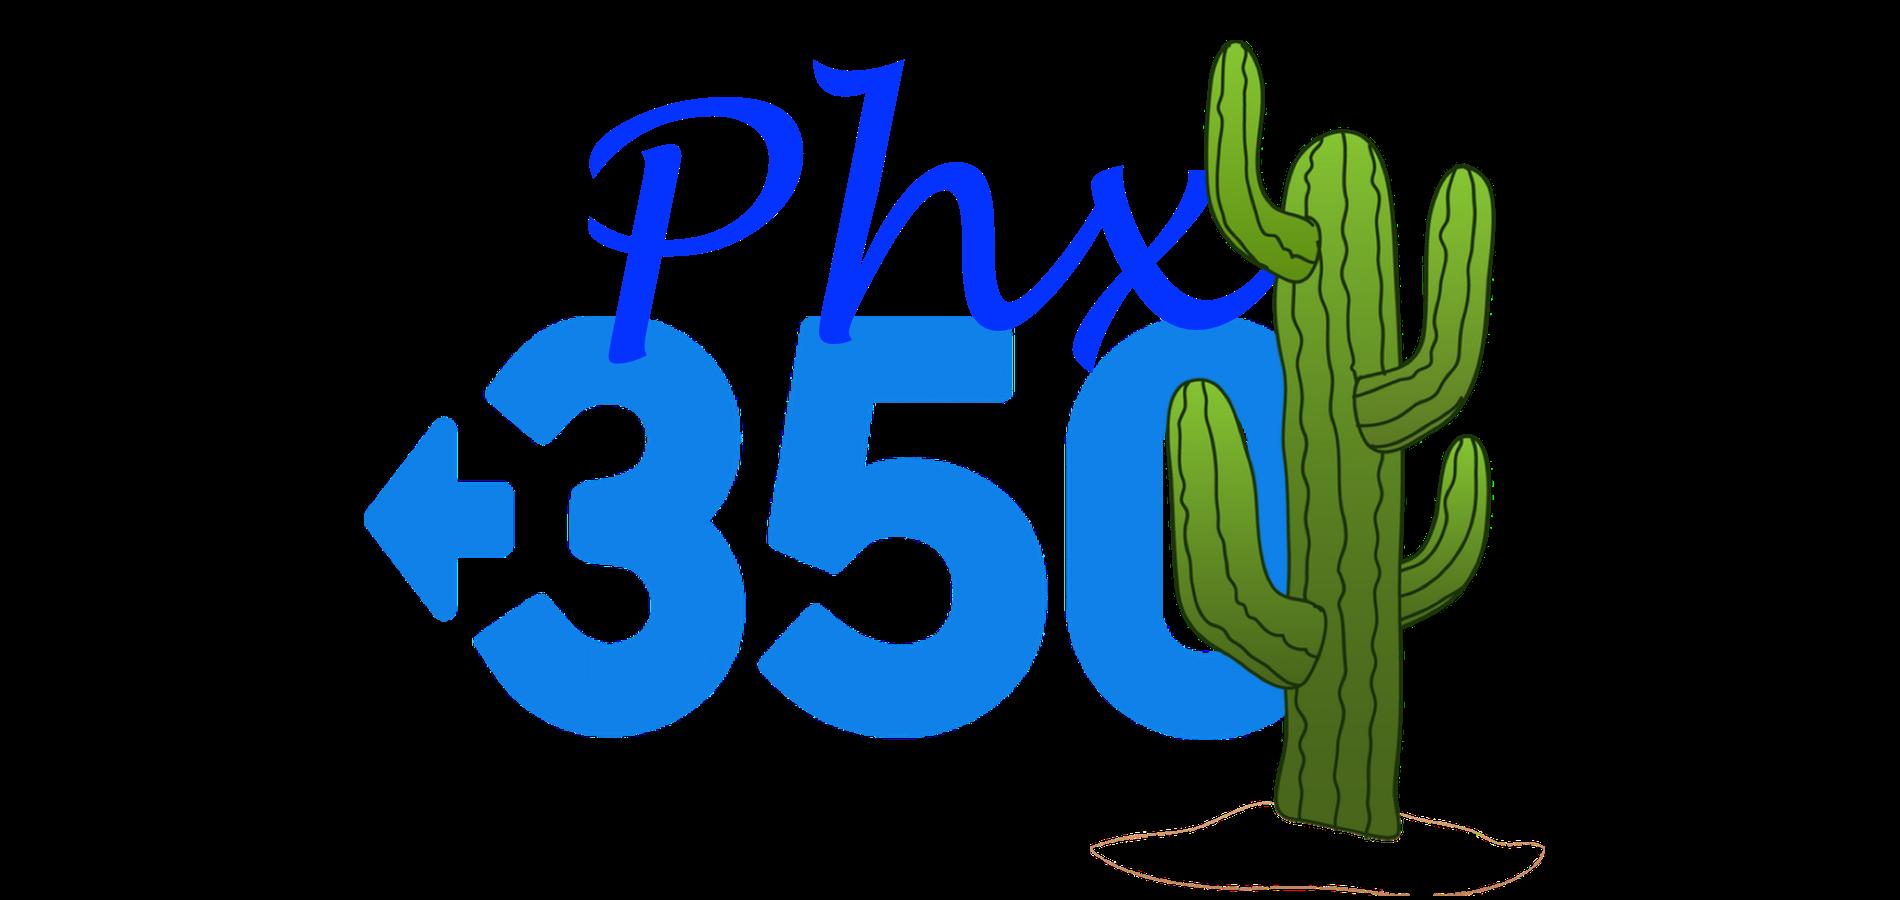 Phx 350